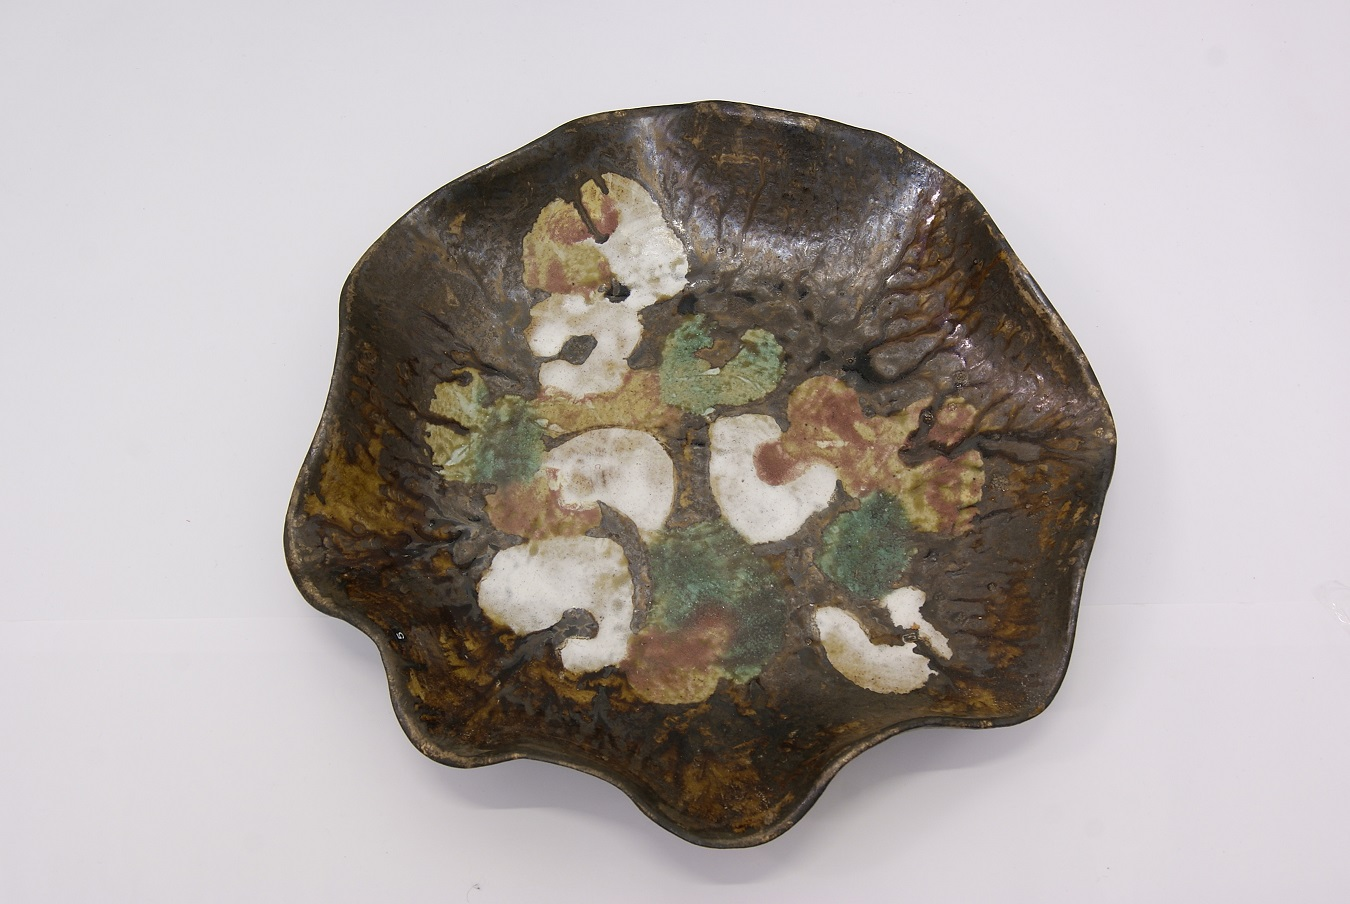 Milton Moon, Platter, stoneware, w47cm, 2010. Photo courtesy of Aptos Cruz Galleries.JPG